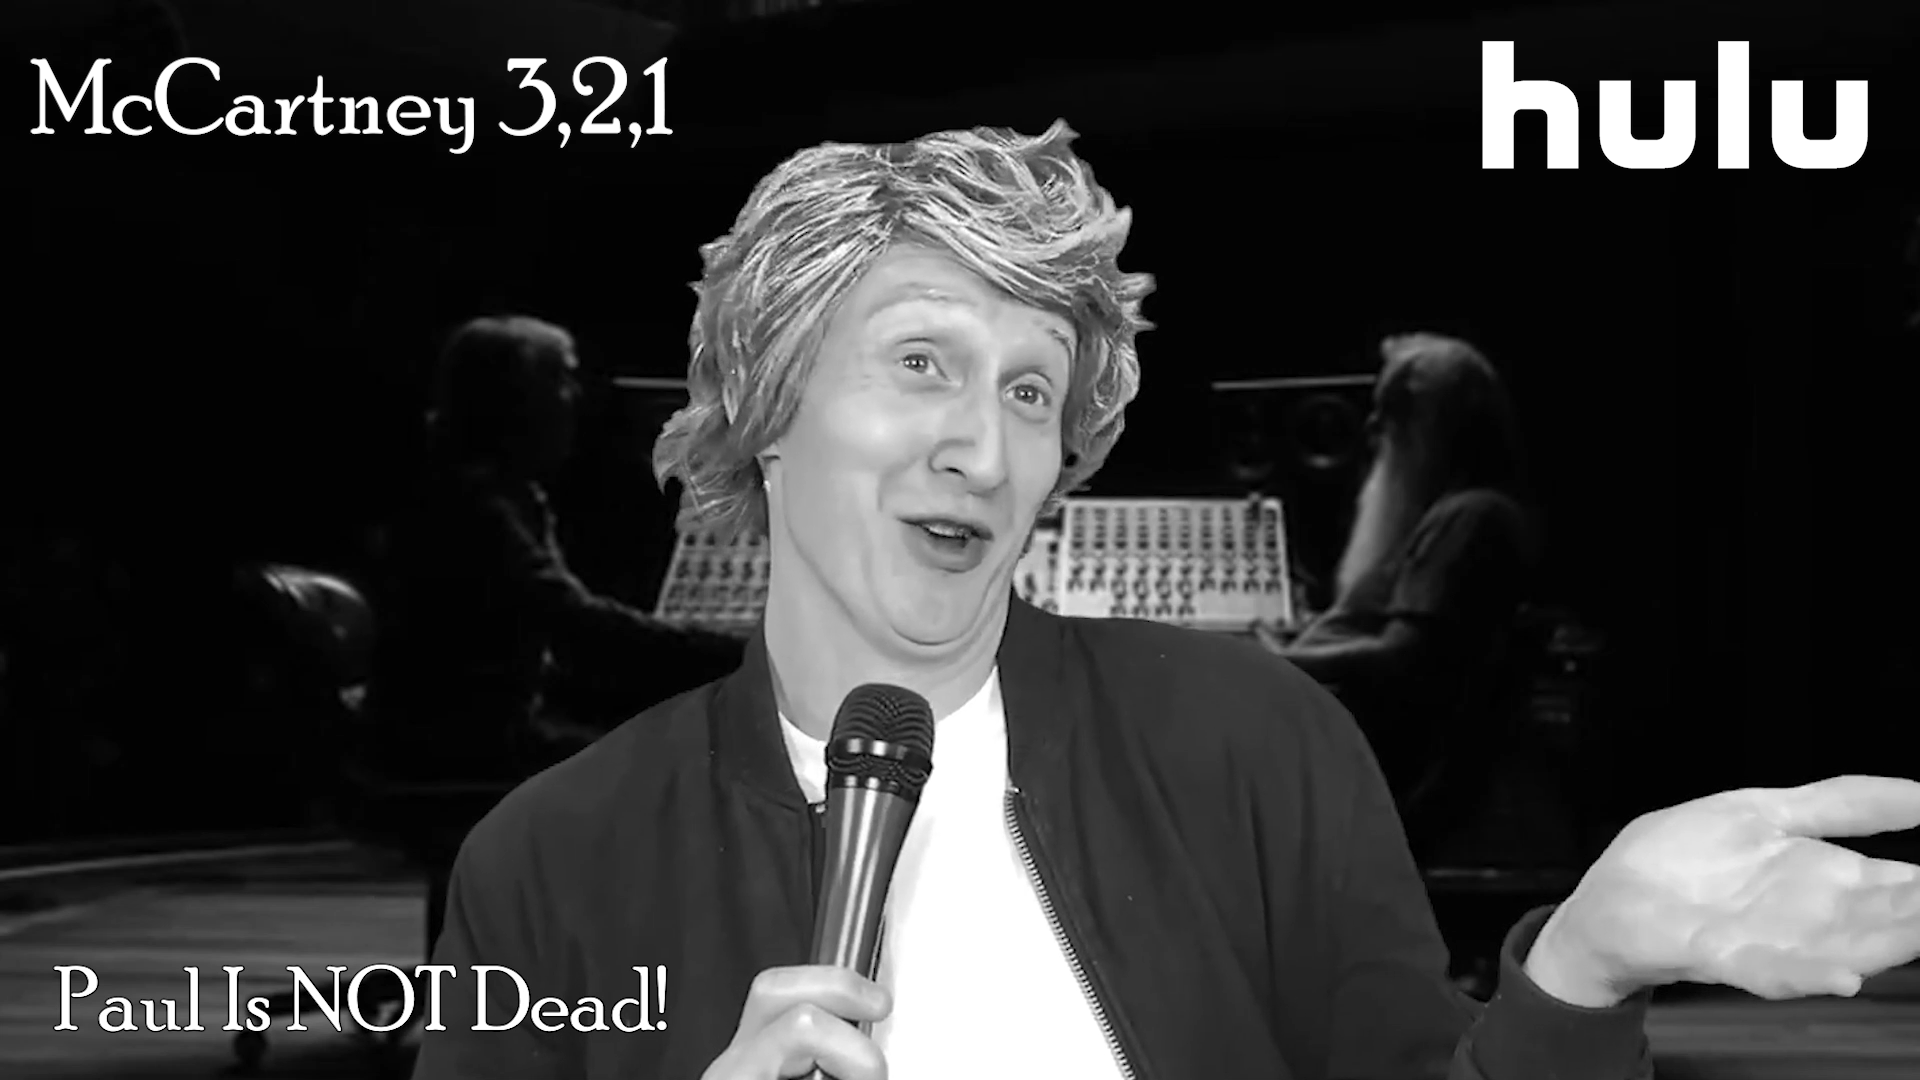 "McCartney 3,2,1 Hulu series parody spoof satire comedy comedian impression ""Paul McCartney"" Beatles music LA Los Angeles Hollywood actor talk show host Twitch"